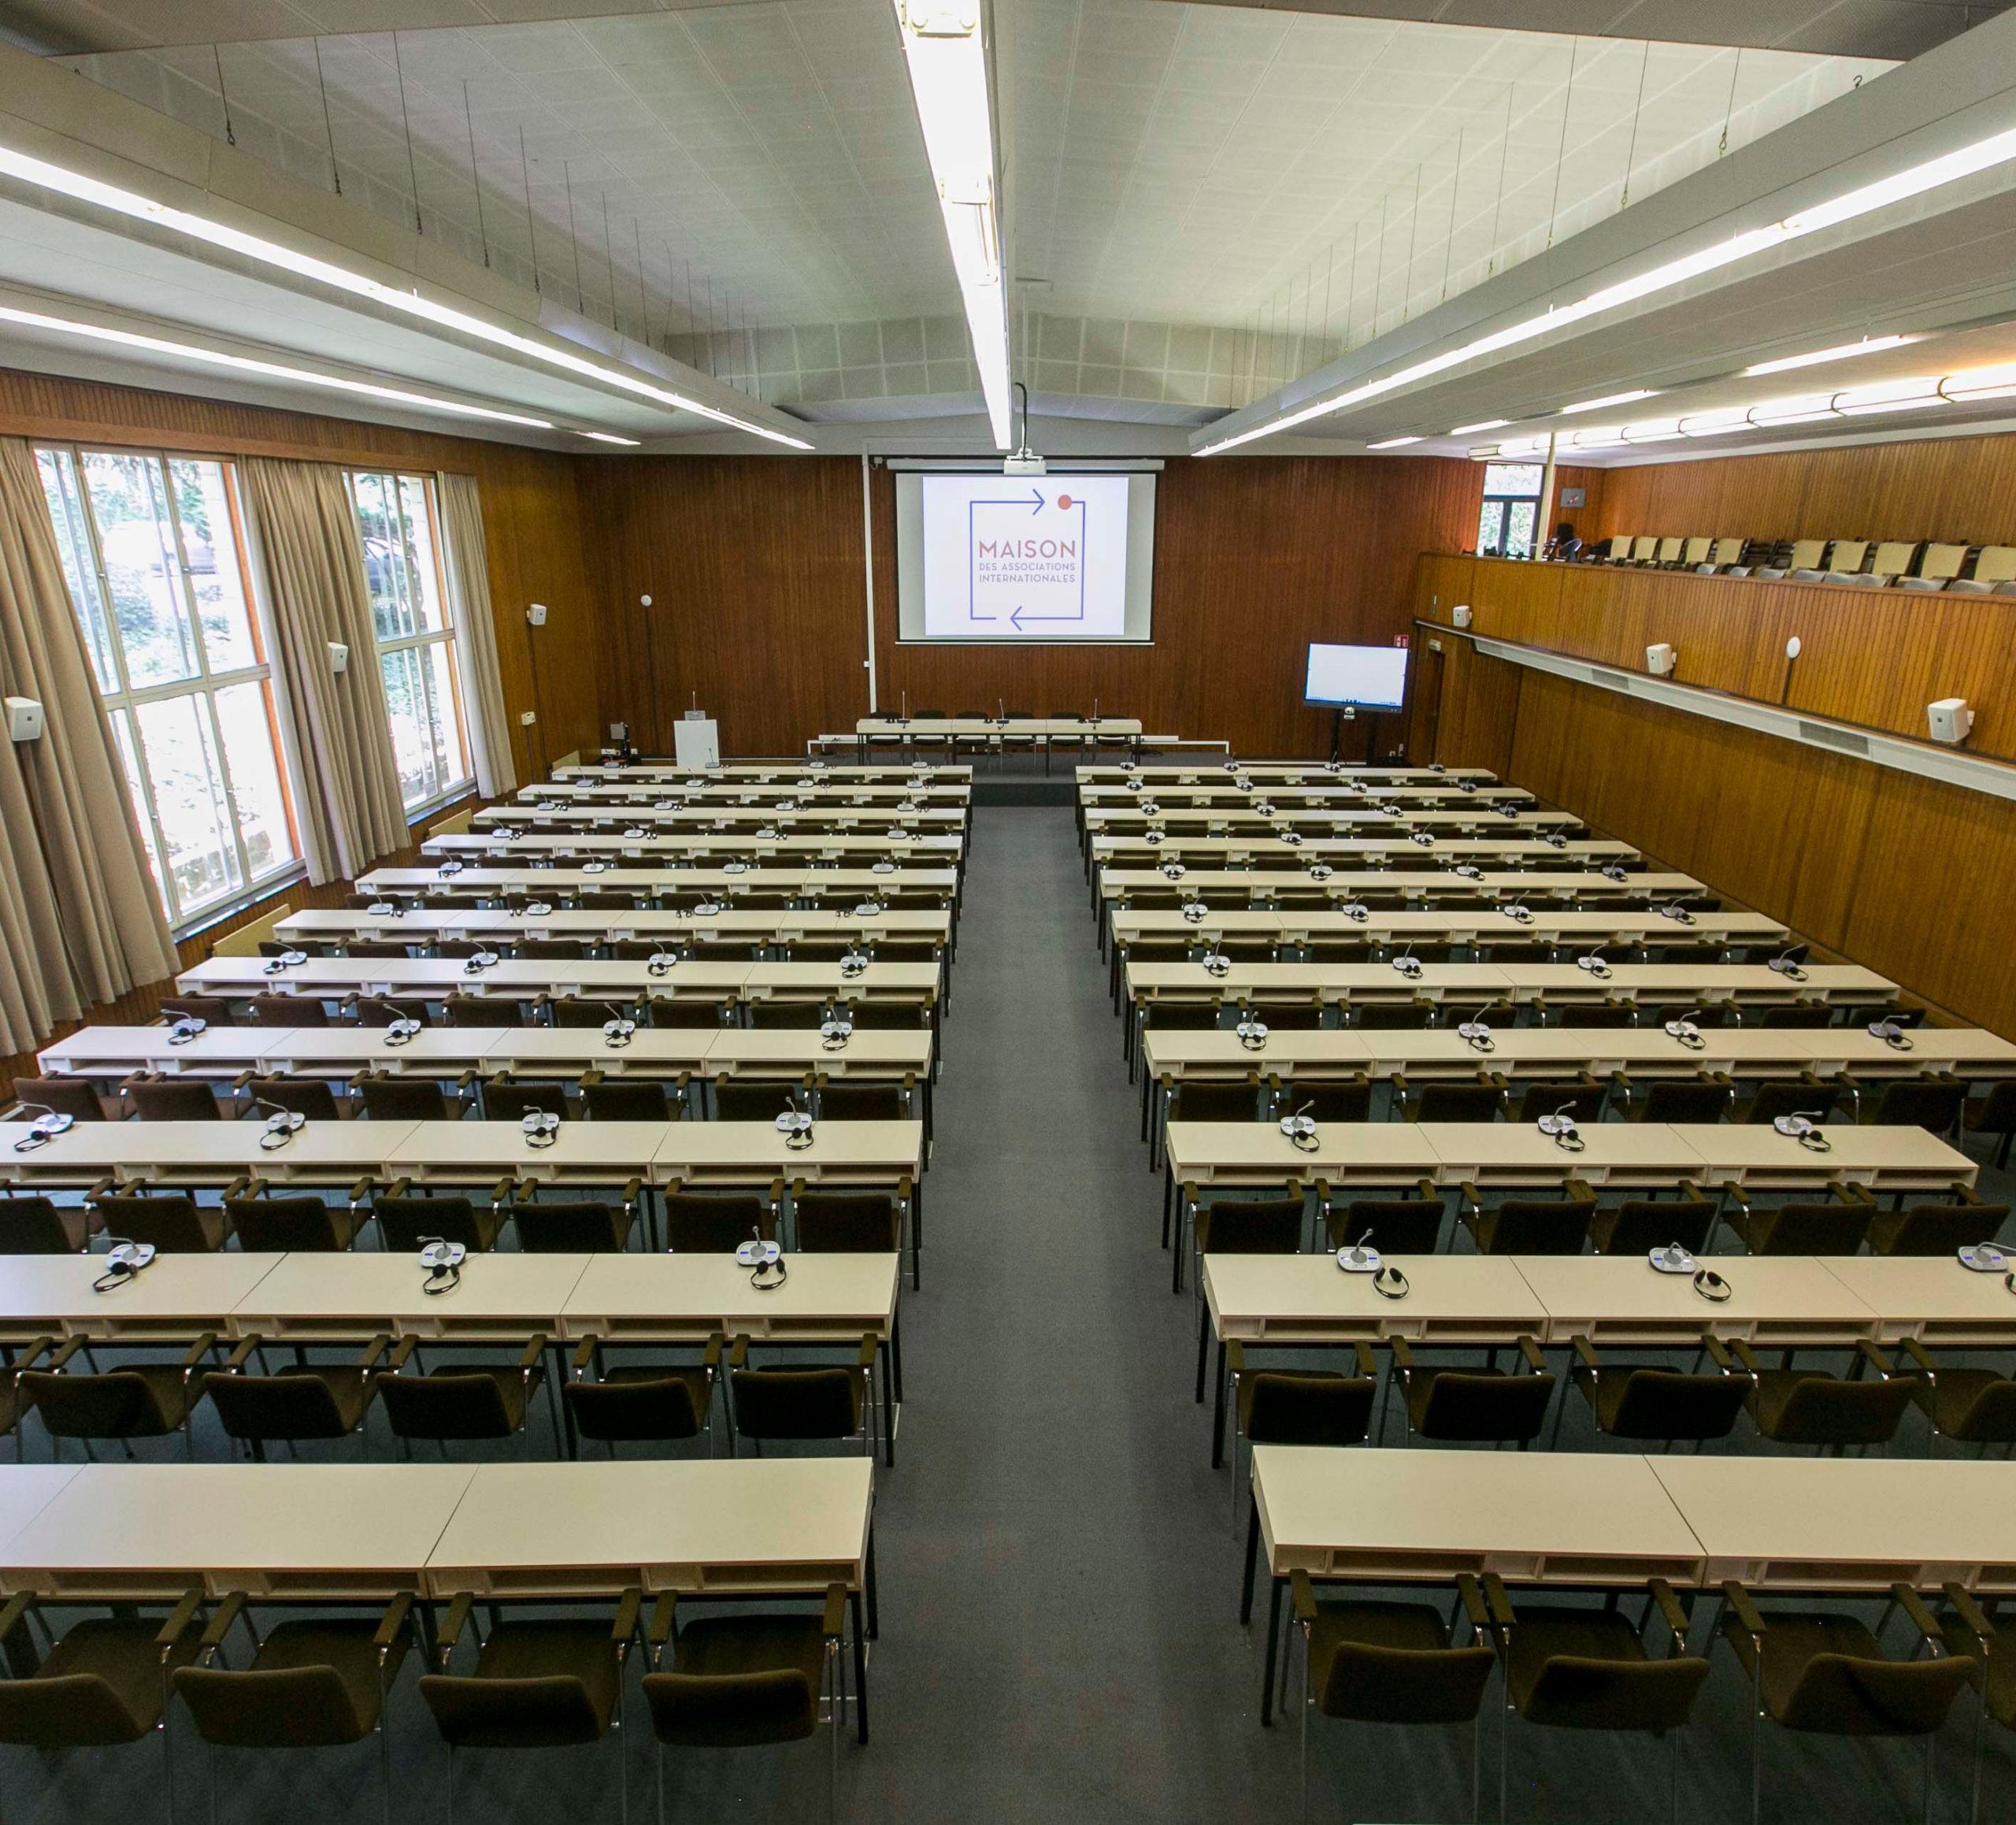 Meeting center - Maison des associations internationales - M.A.I.